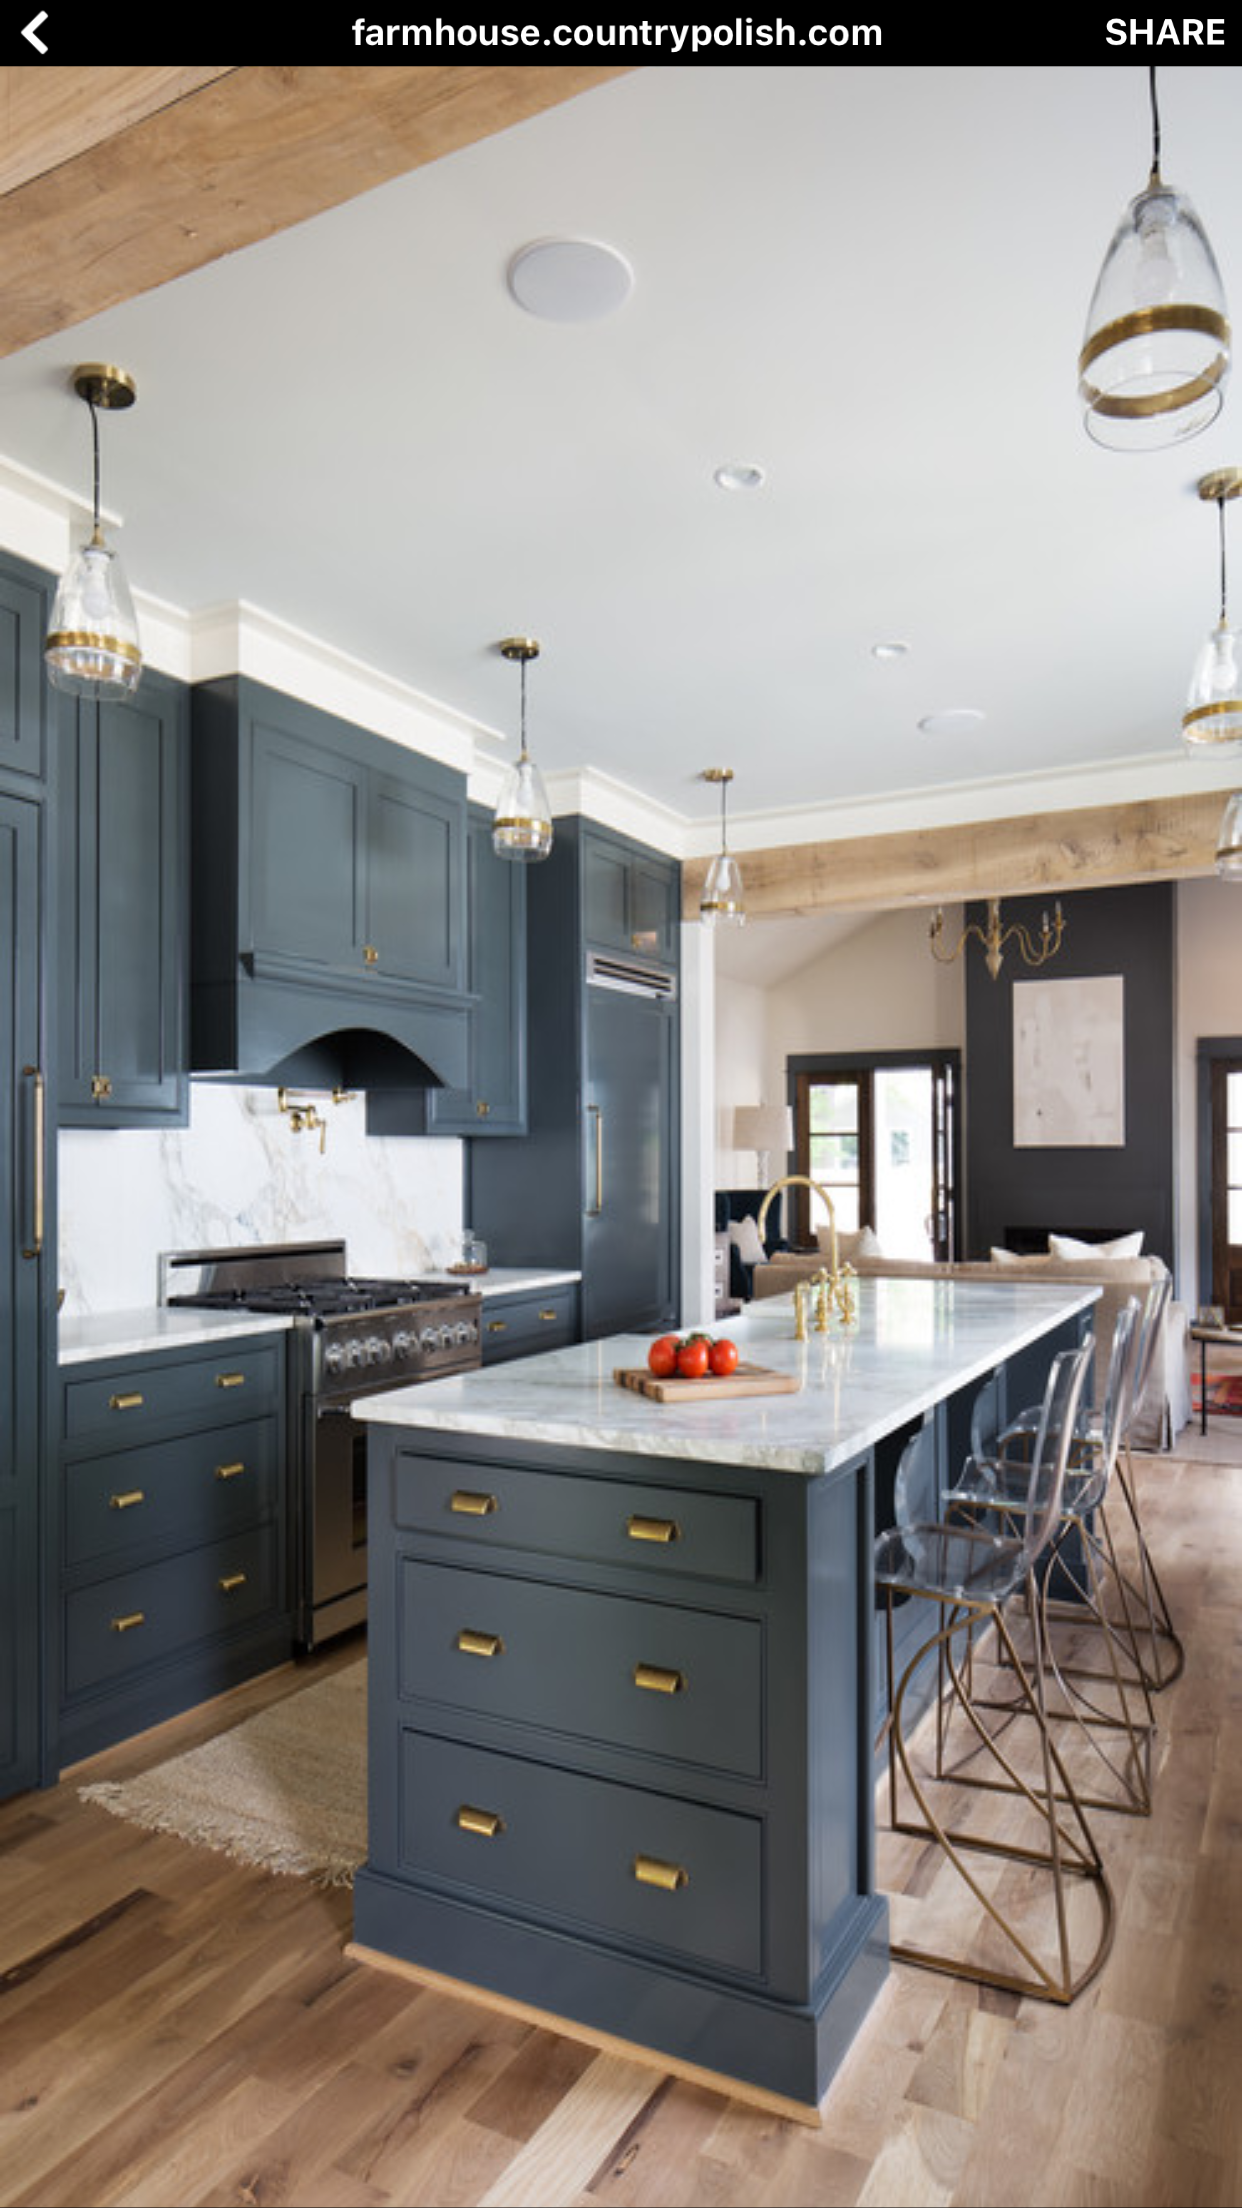 Pin By Hilary Craig On Modern Kitchen Pinterest Kuche Haus